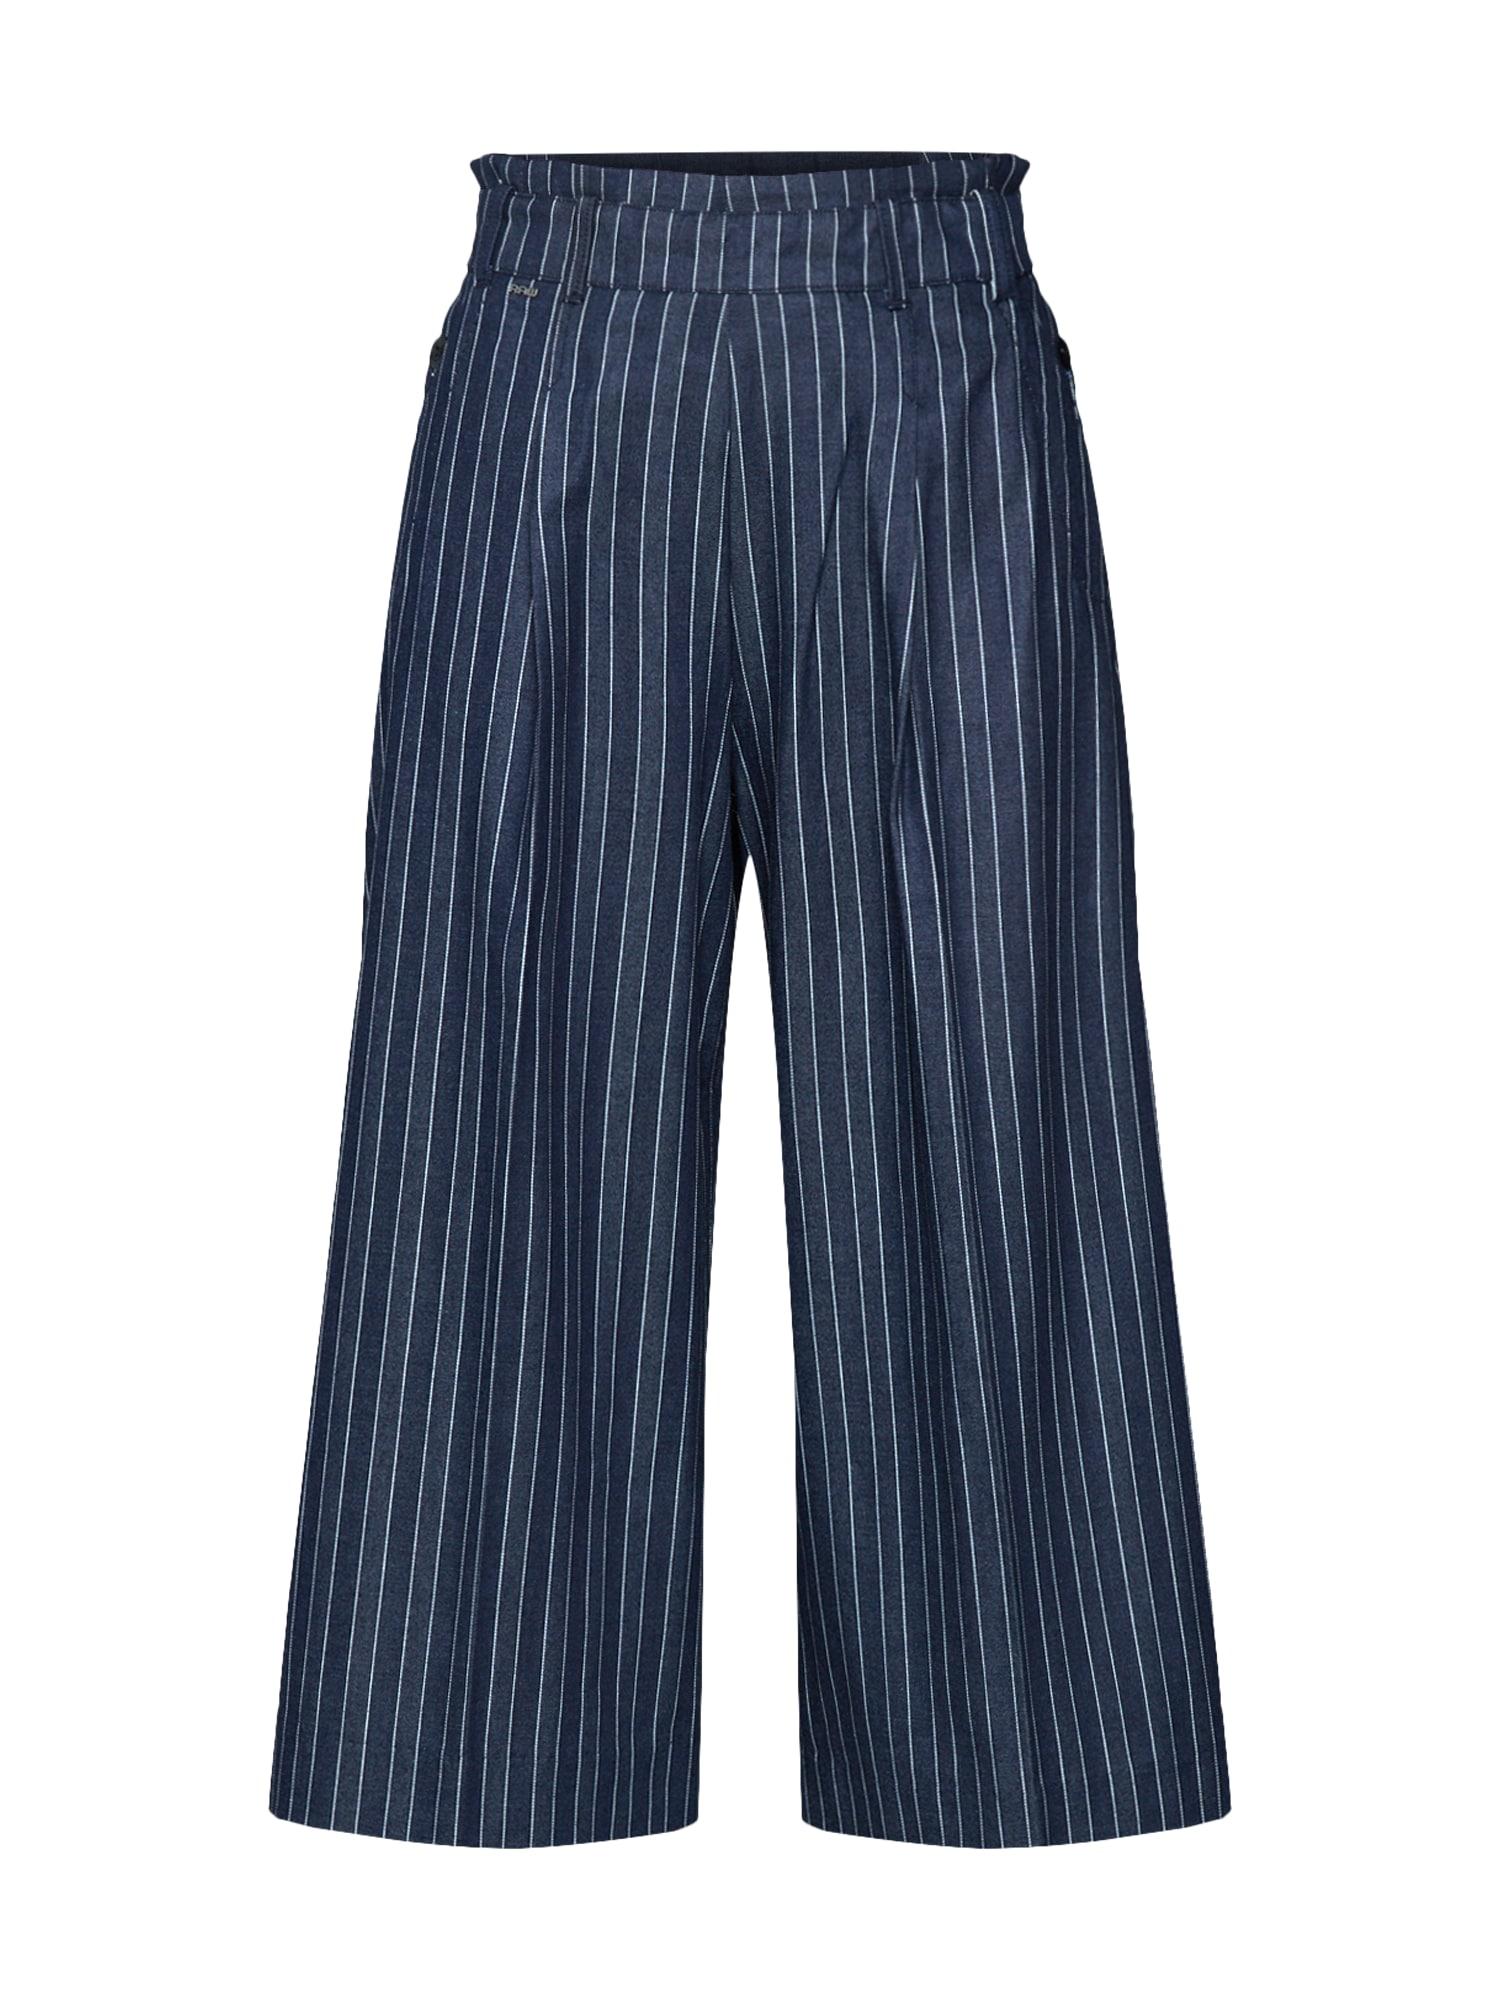 G-Star RAW Džinsai 'Ramin' tamsiai (džinso) mėlyna / šviesiai mėlyna